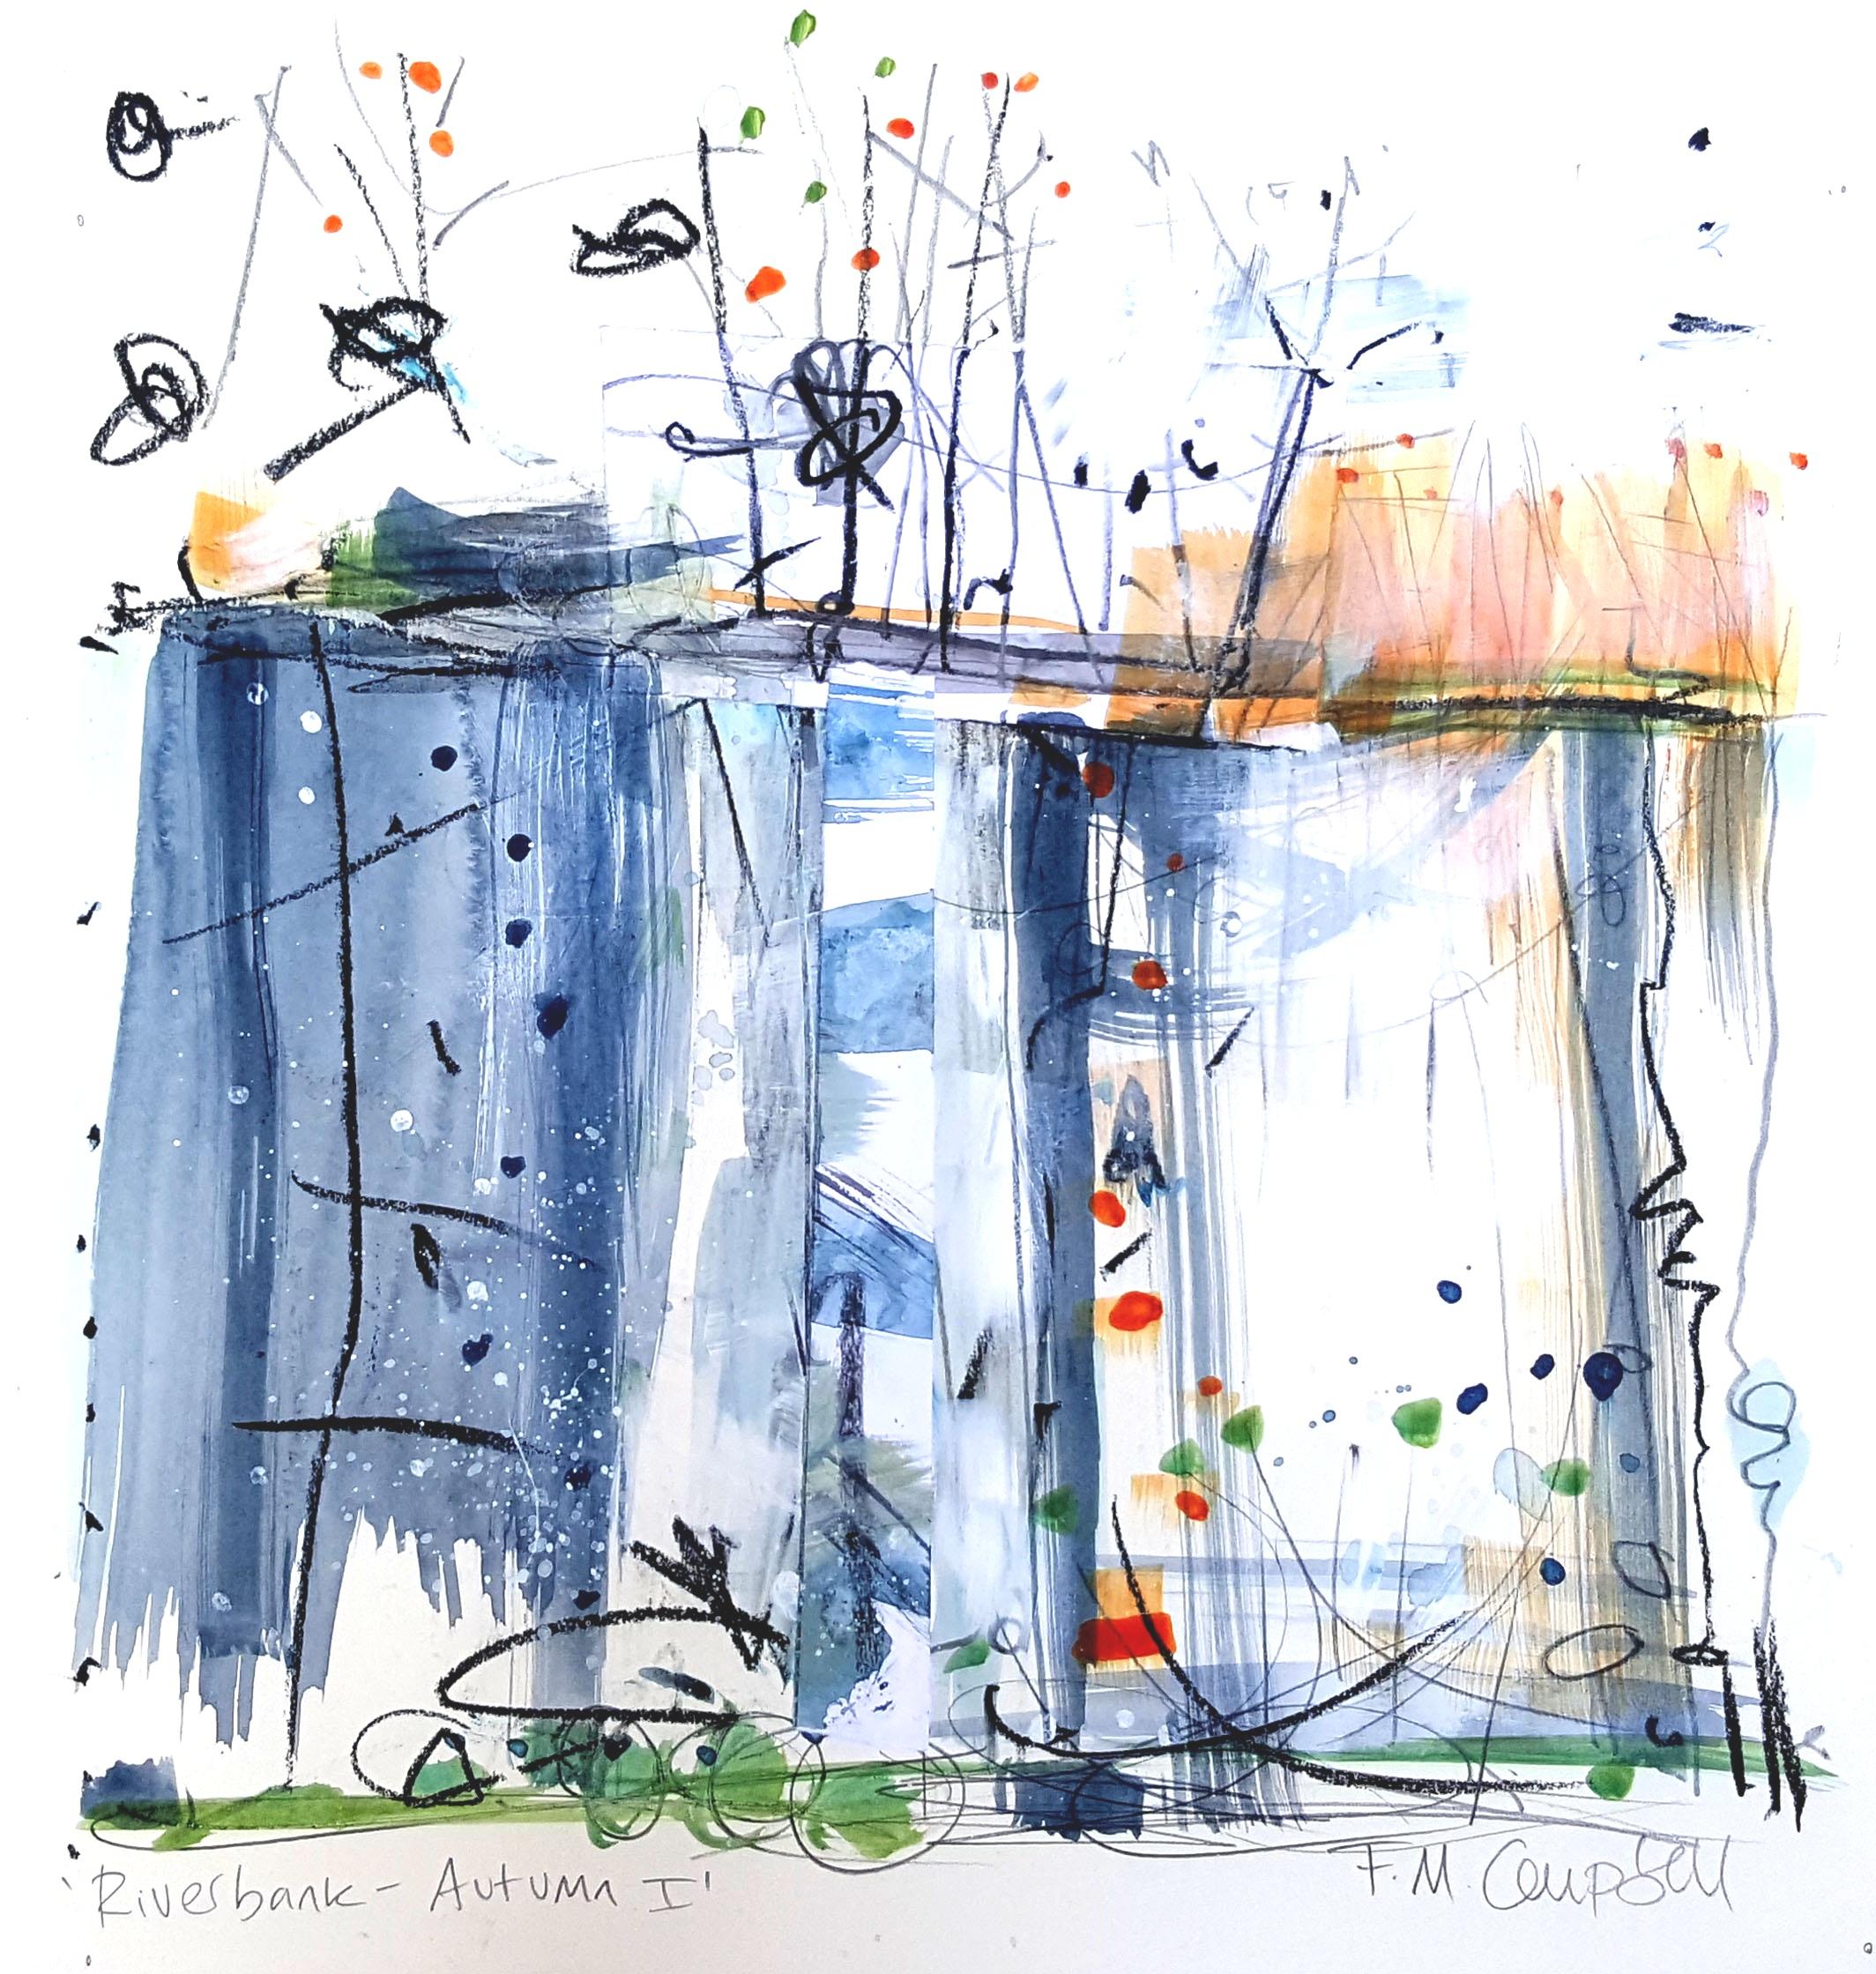 'Riverbank - Autumn I'